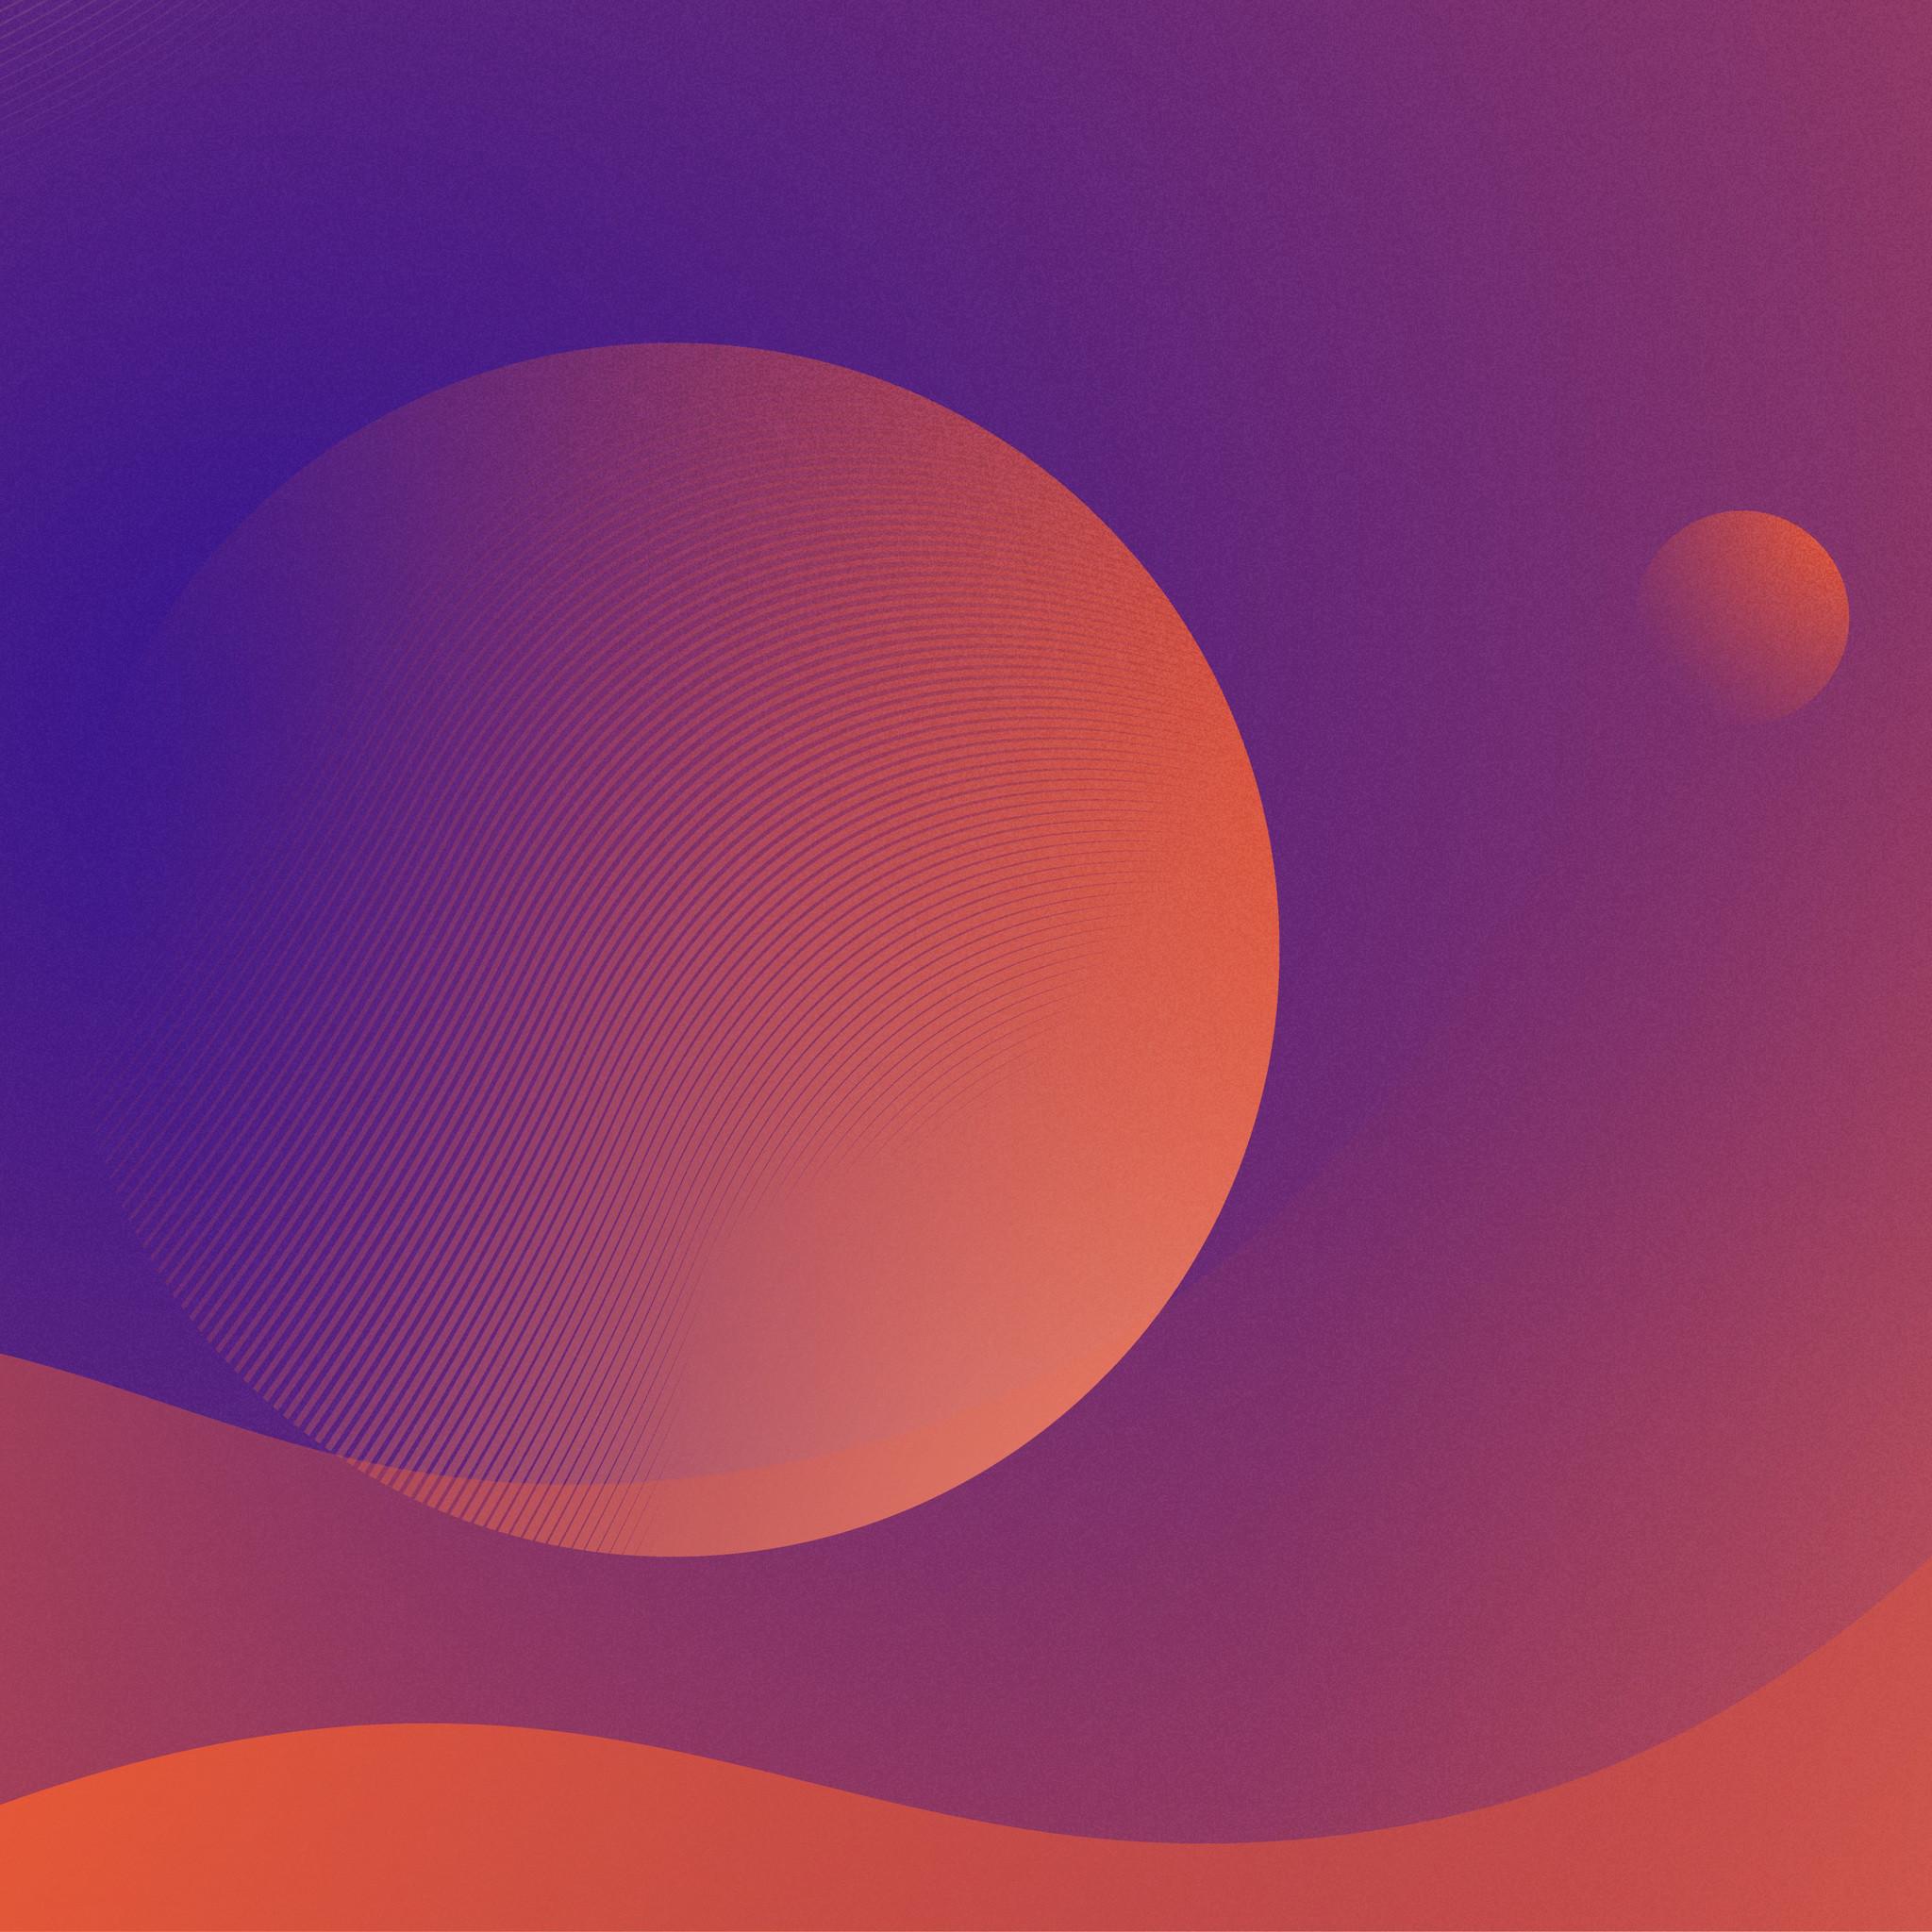 Planet Mars Wallpaper (72+ Images